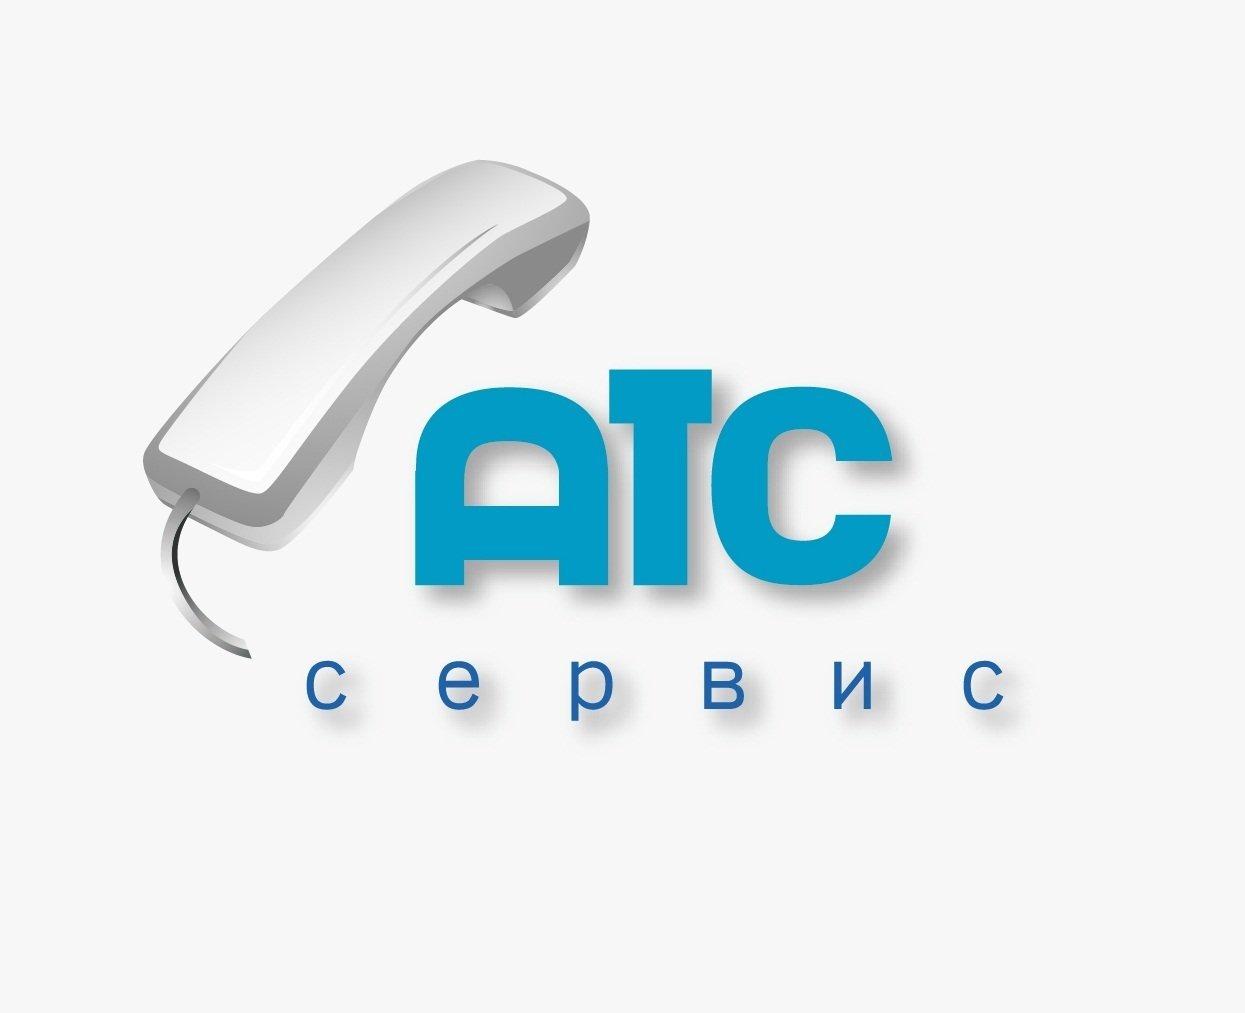 Установка и настройка IP терминала (SoftPhone) - 1 шт